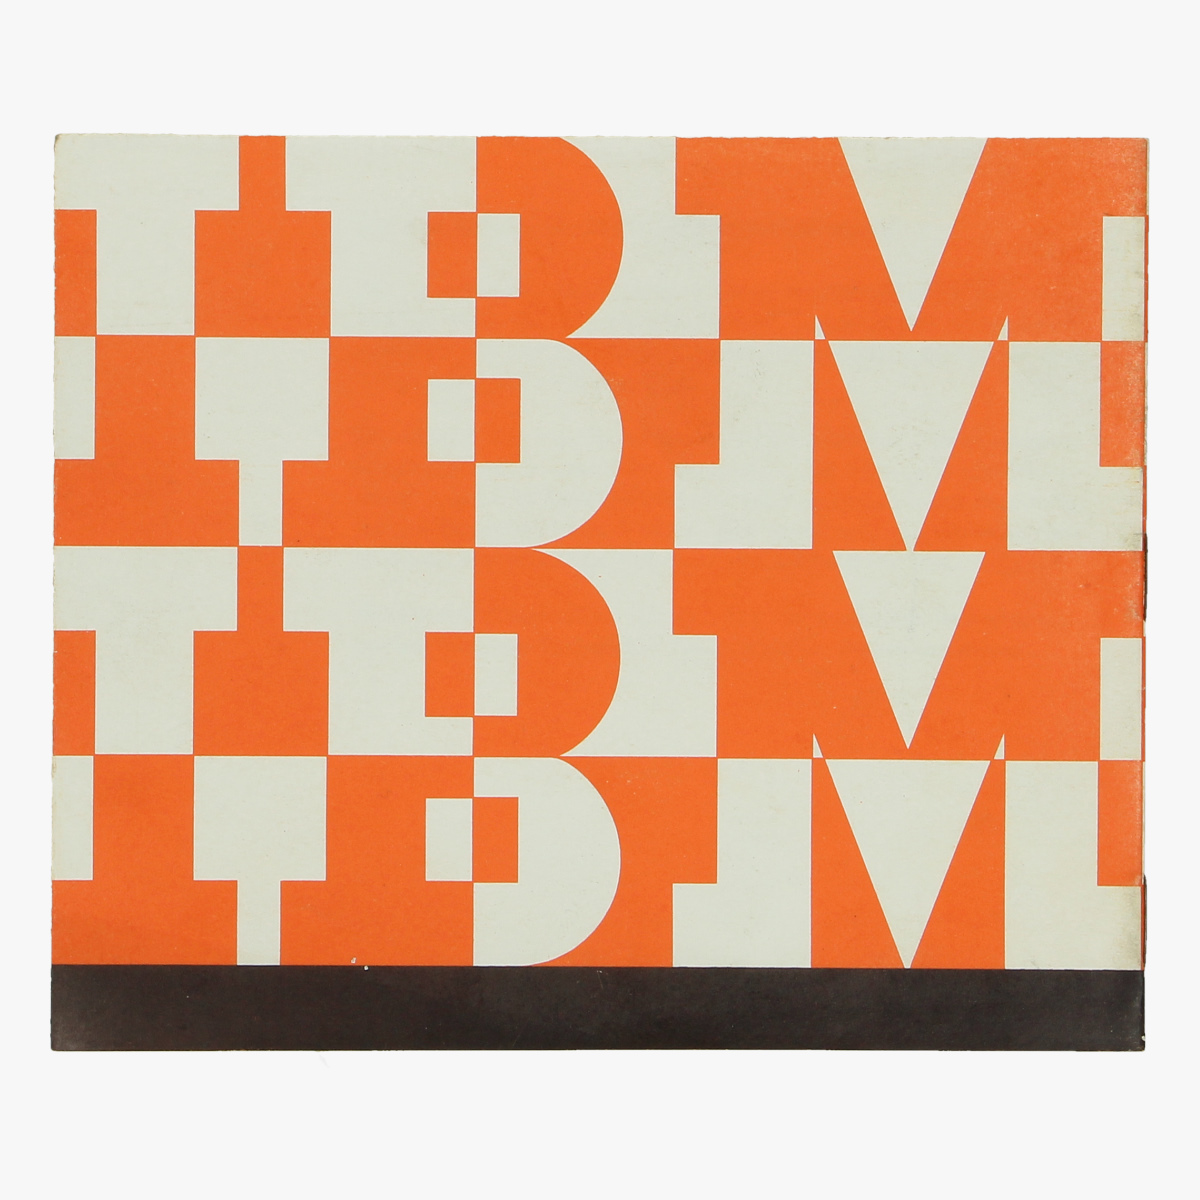 Afbeeldingen van ibm pavillon tentoonstellingsgids wereldtentoonstelling brussel 1958